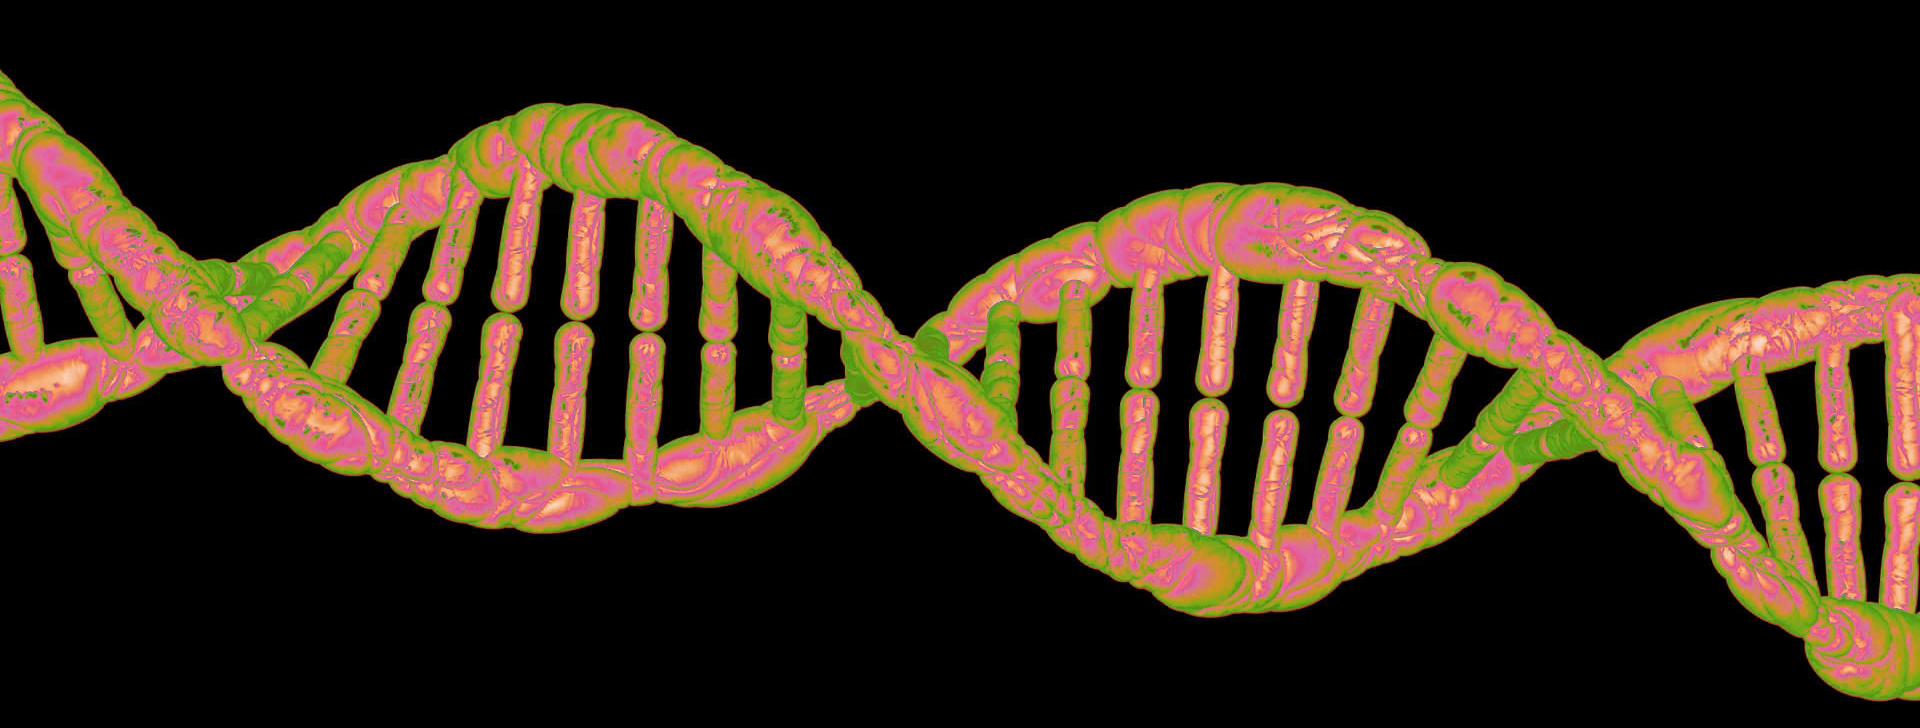 pinkgreenDNA